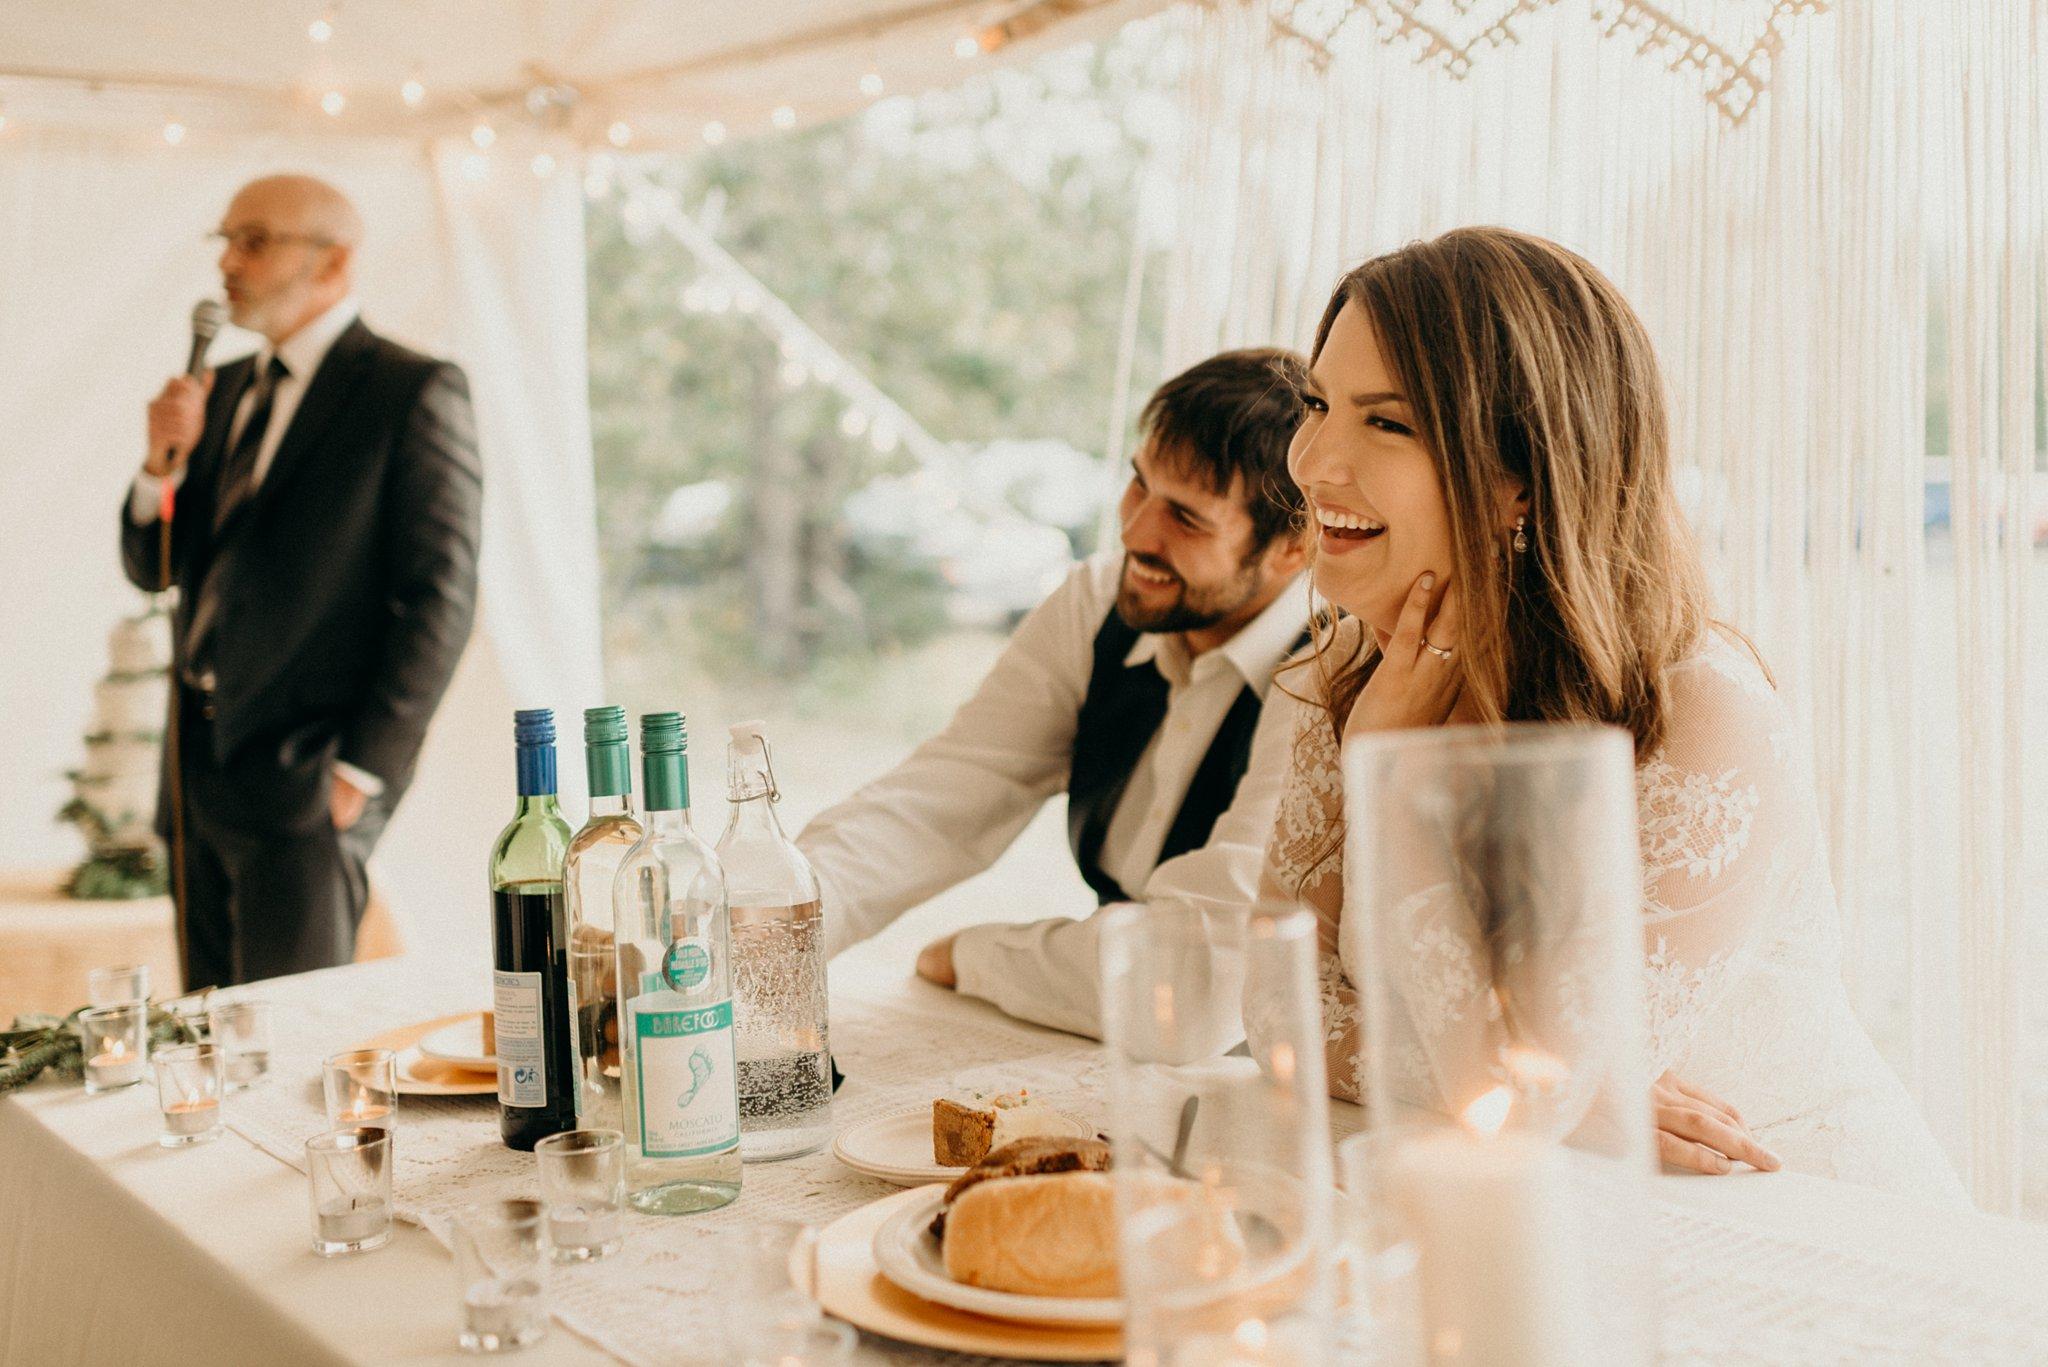 kaihla_tonai_intimate_wedding_elopement_photographer_6776.jpg